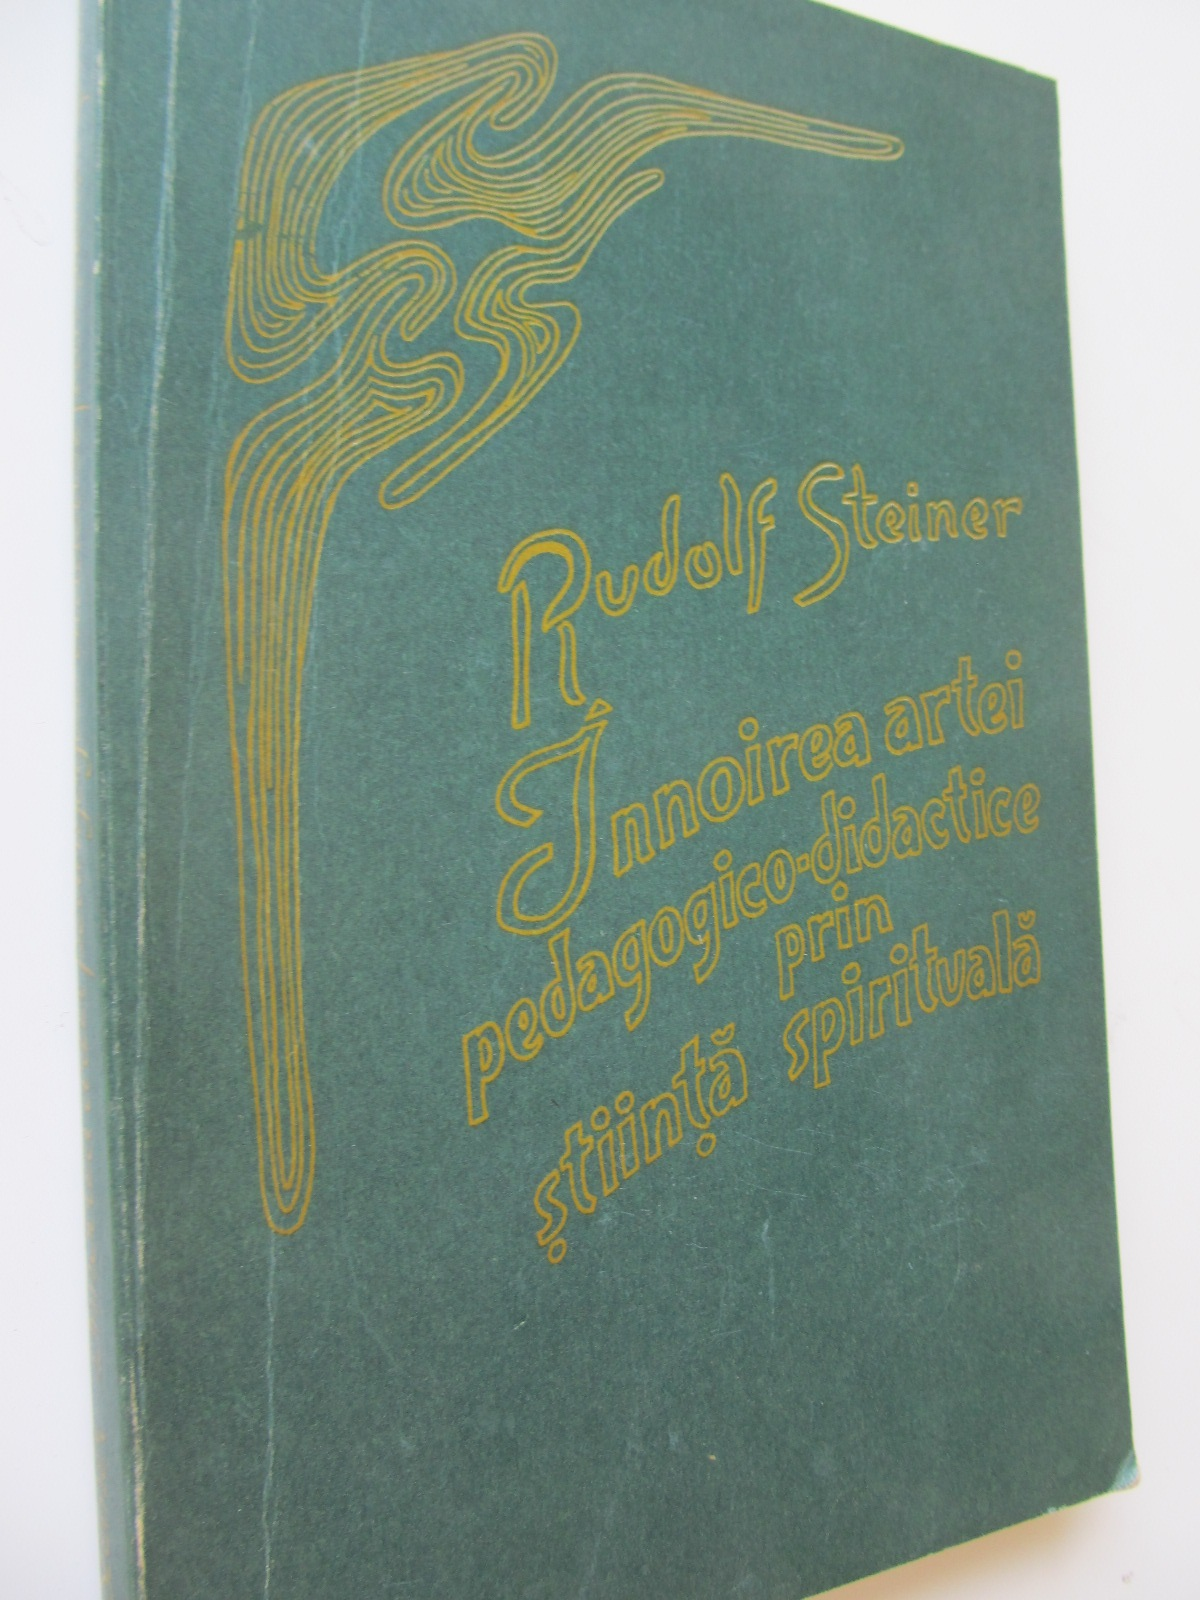 Innoirea artei pedagogico-didactice prin stiinta spirituala - Rudolf Steiner | Detalii carte